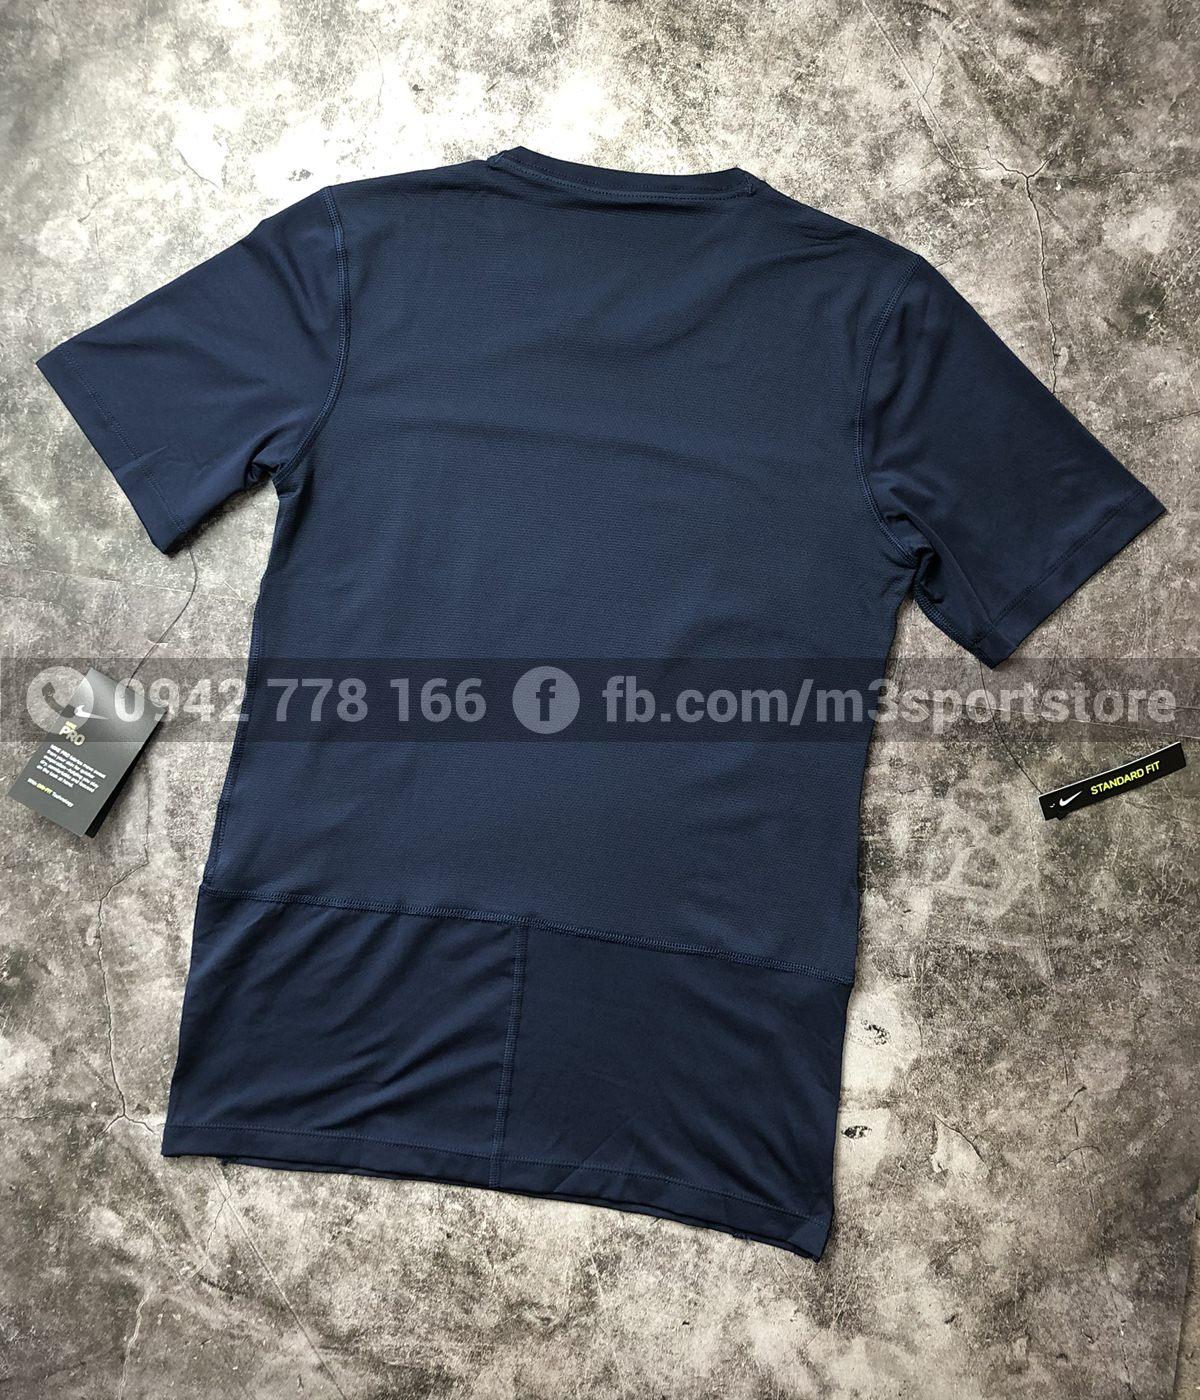 Áo thể thao nam Nike training Sleeve Graphic CT2923